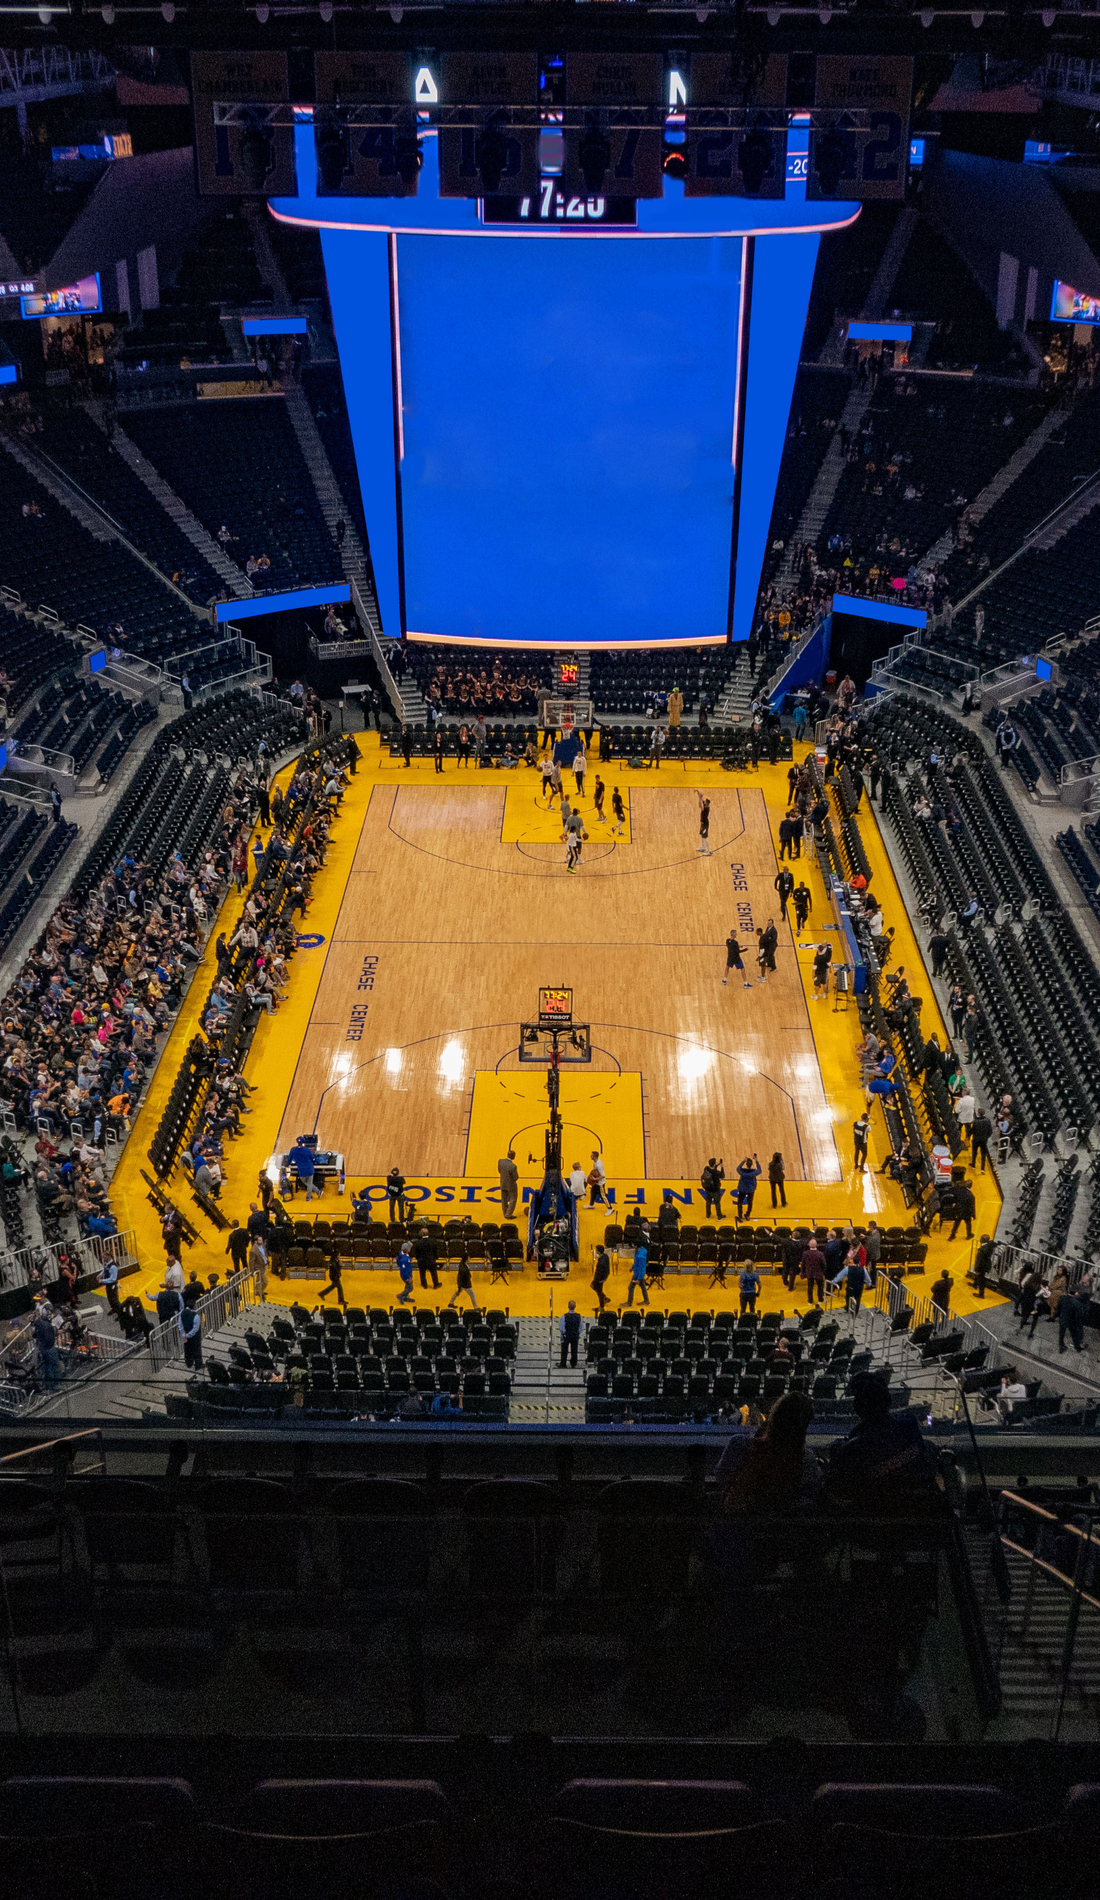 A Golden State Warriors live event